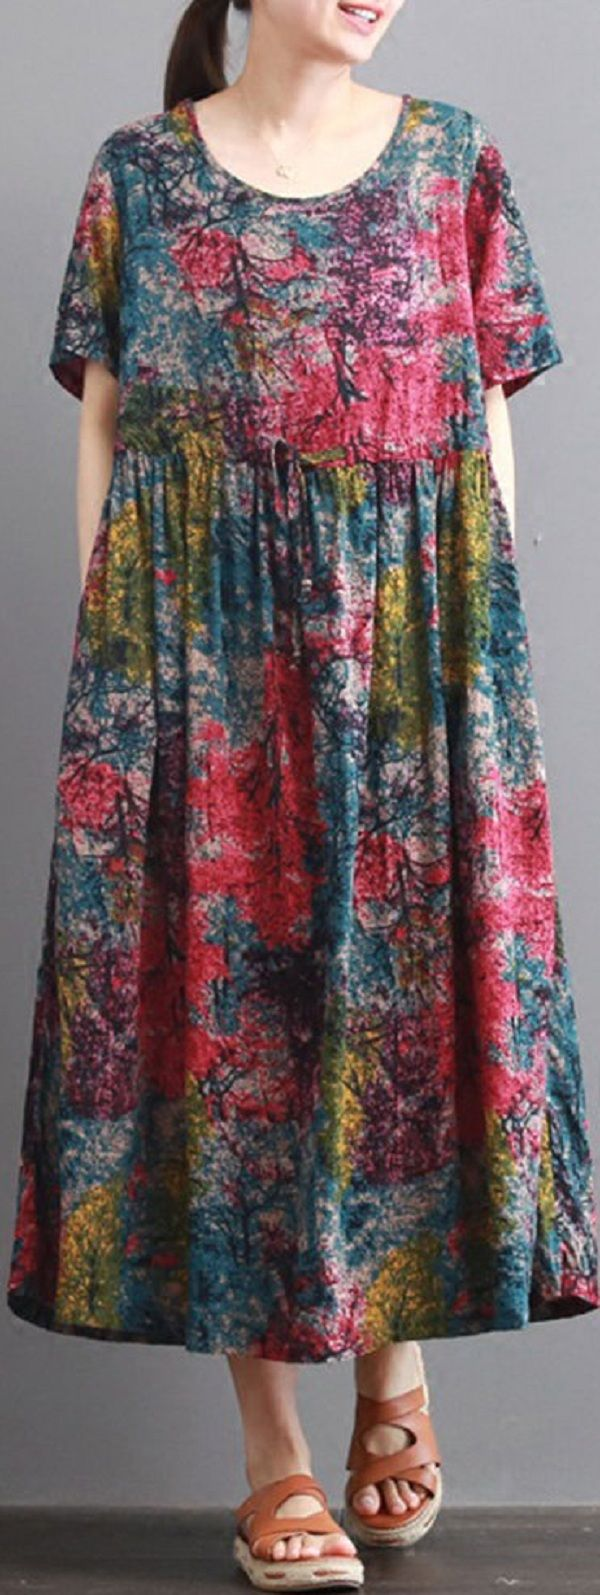 US$ 23.42 O-NEWE Vintage Printed Short Sleeve O-Neck Women A-Line Dress